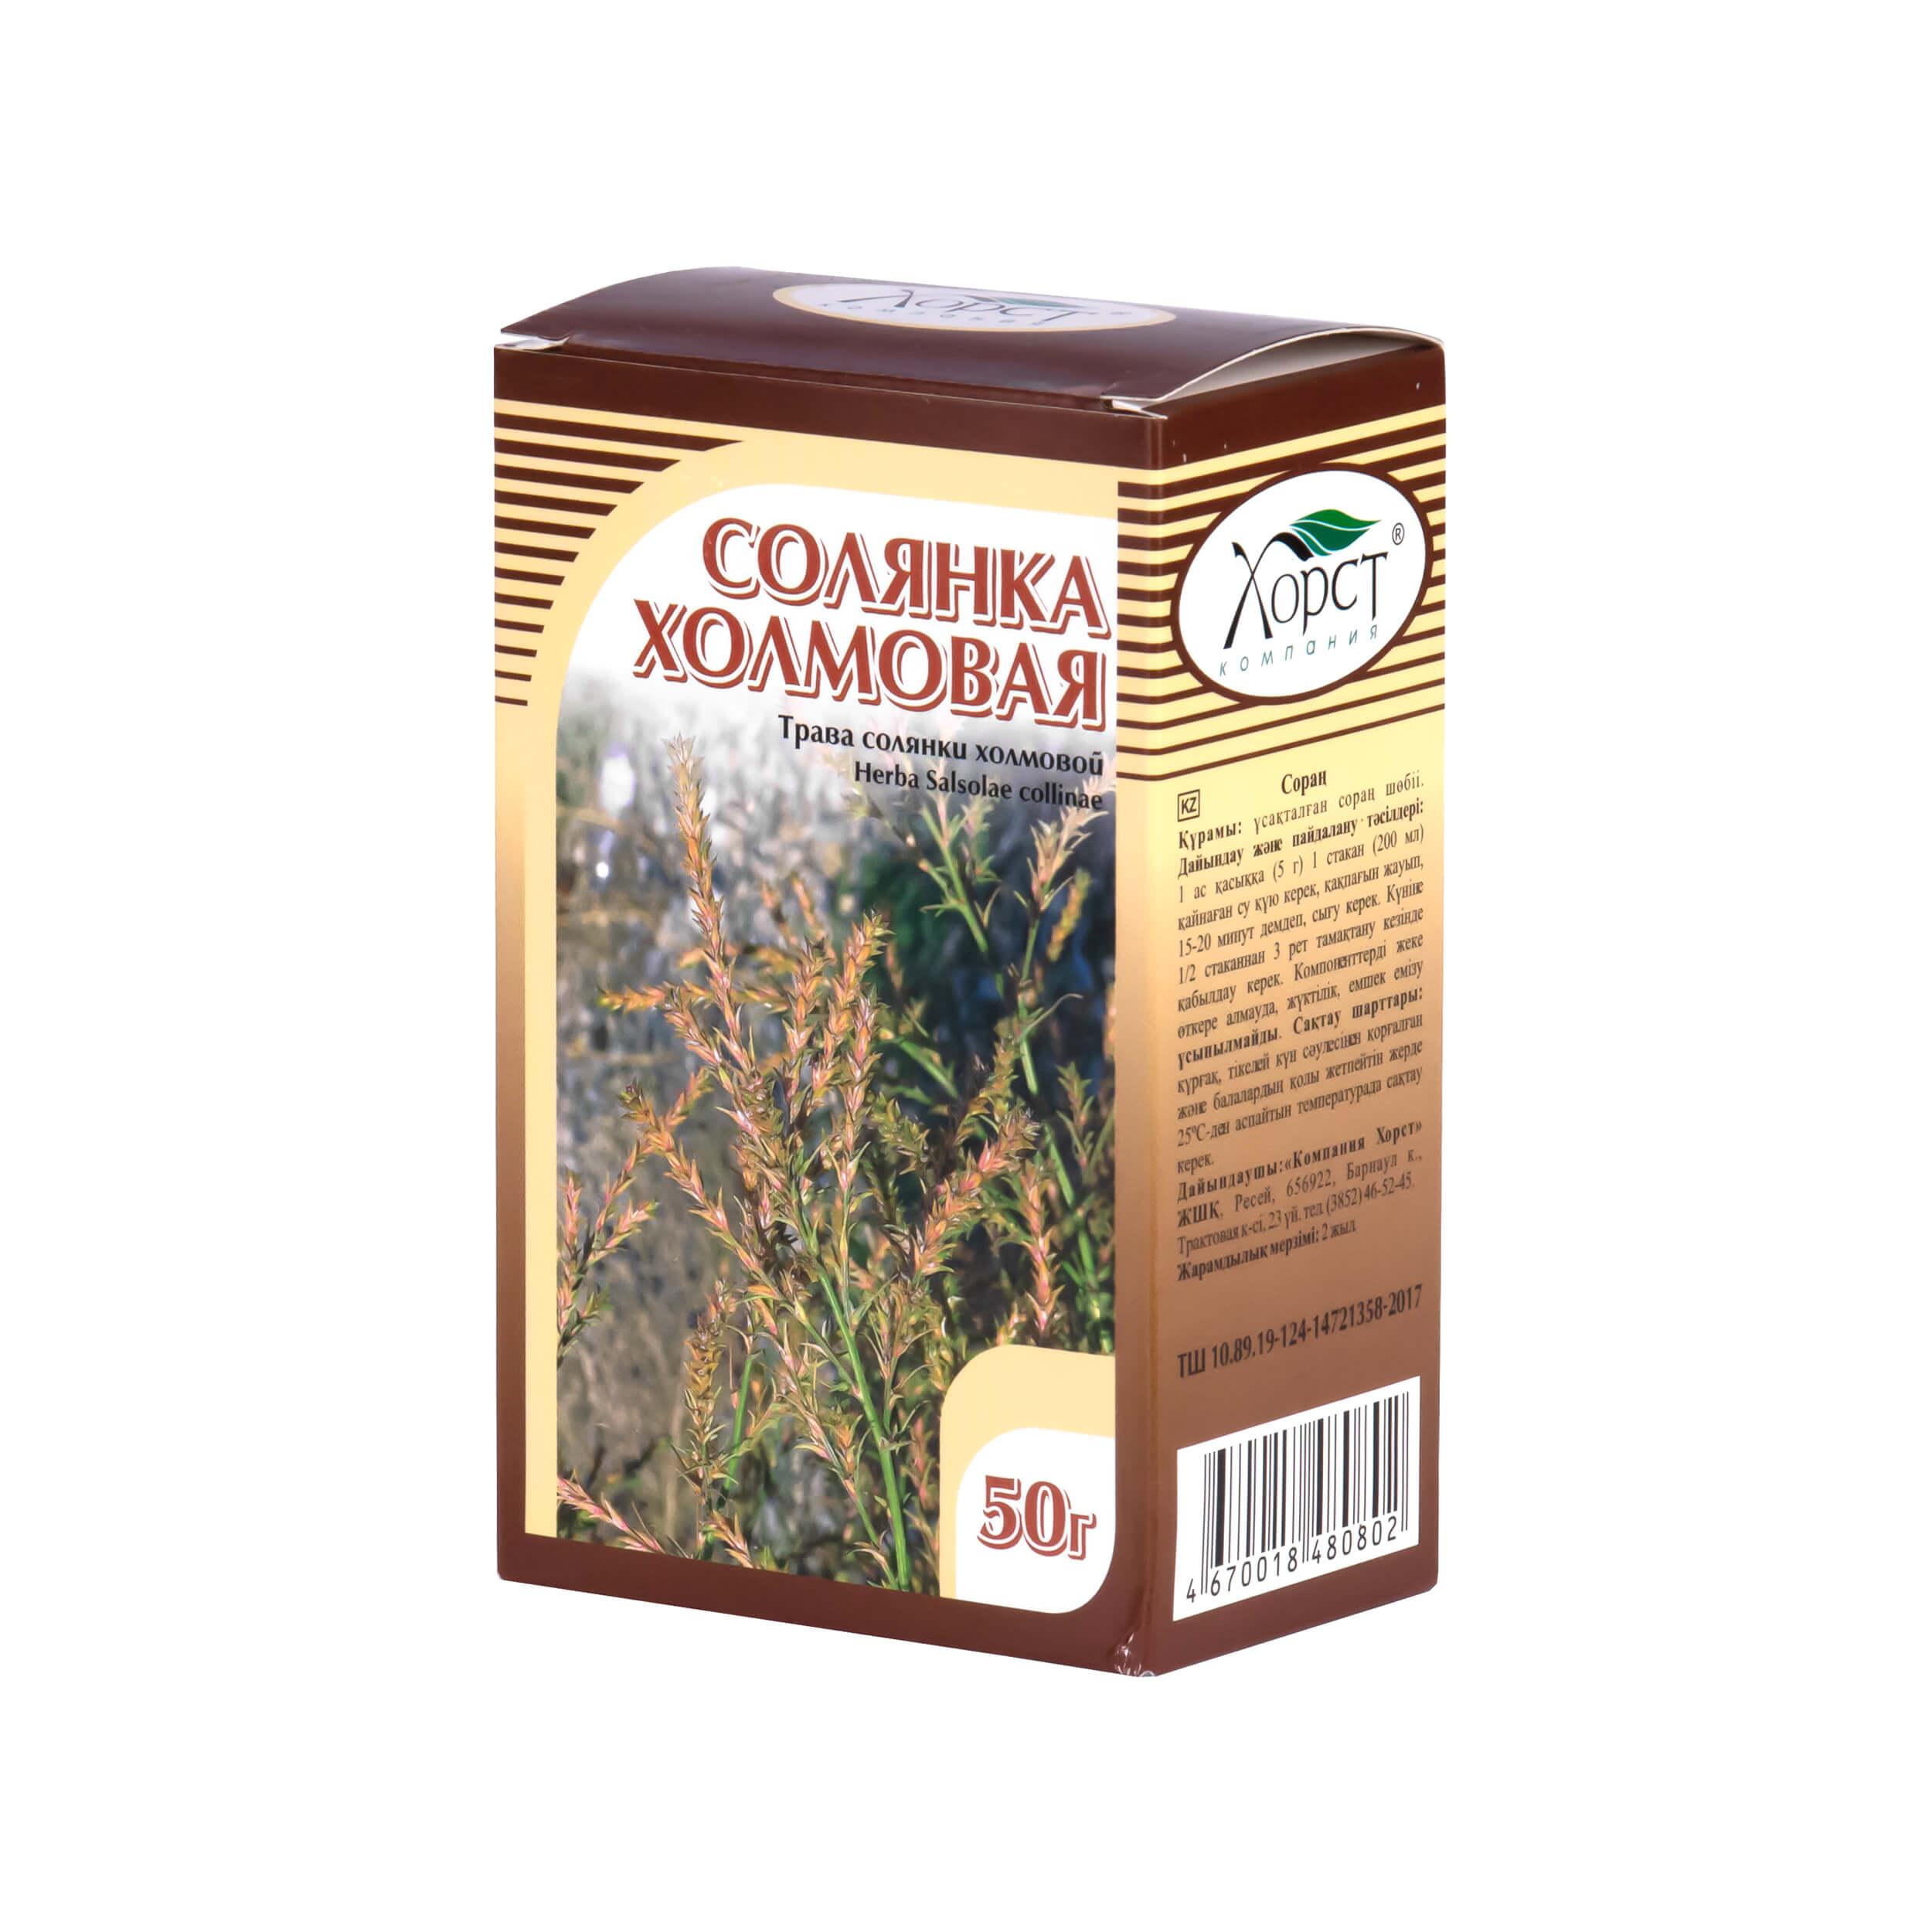 Солянка холмовая (трава, 50 грамм) фото